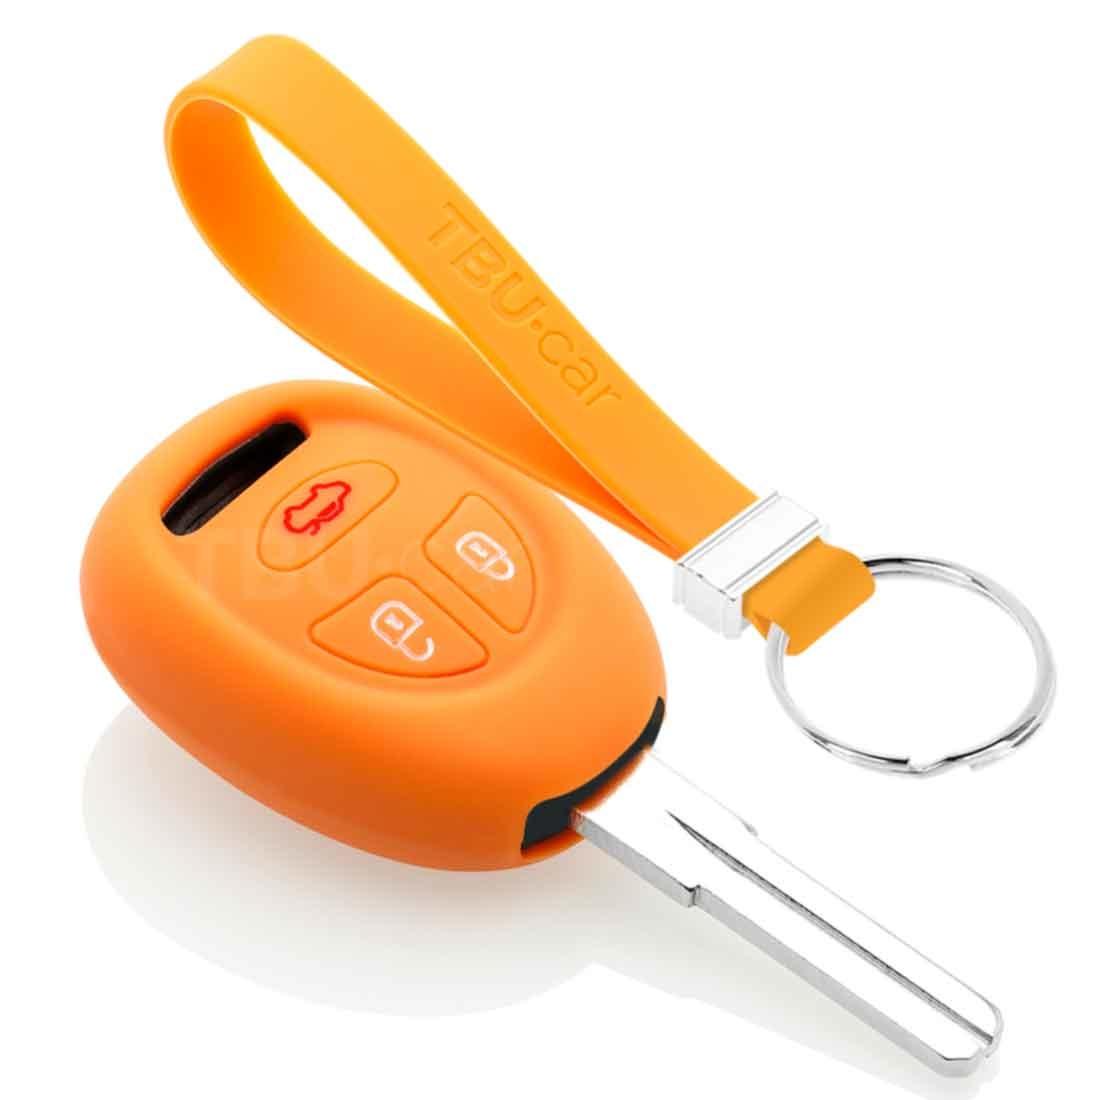 TBU car TBU car Autoschlüssel Hülle kompatibel mit Saab 3 Tasten - Schutzhülle aus Silikon - Auto Schlüsselhülle Cover in Orange